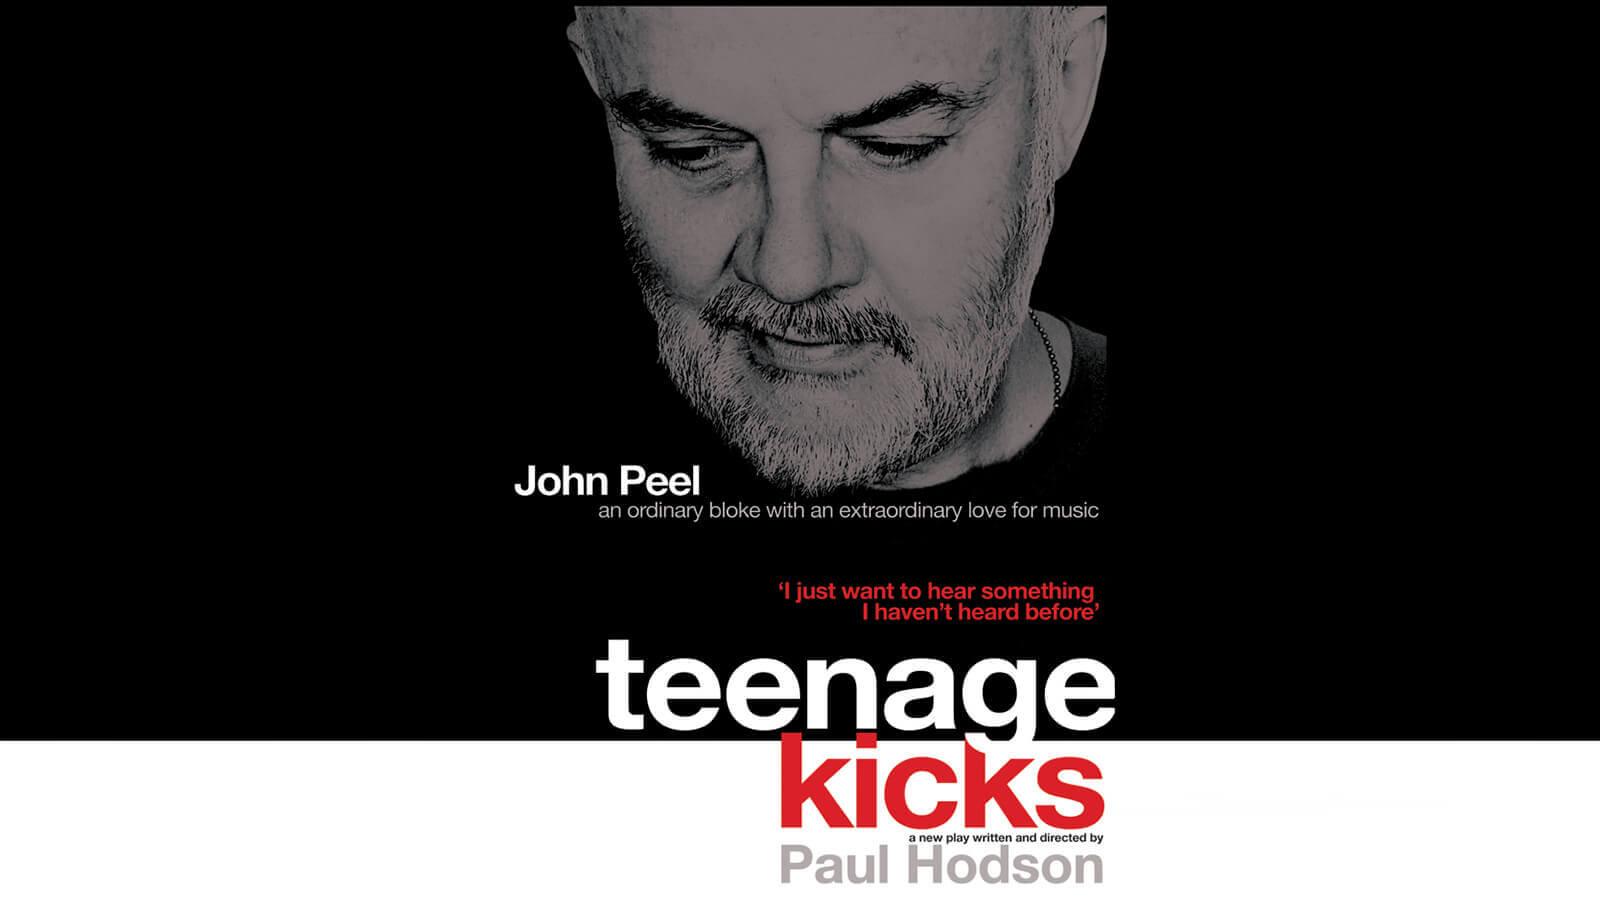 Teenage Kicks Poster Artwork